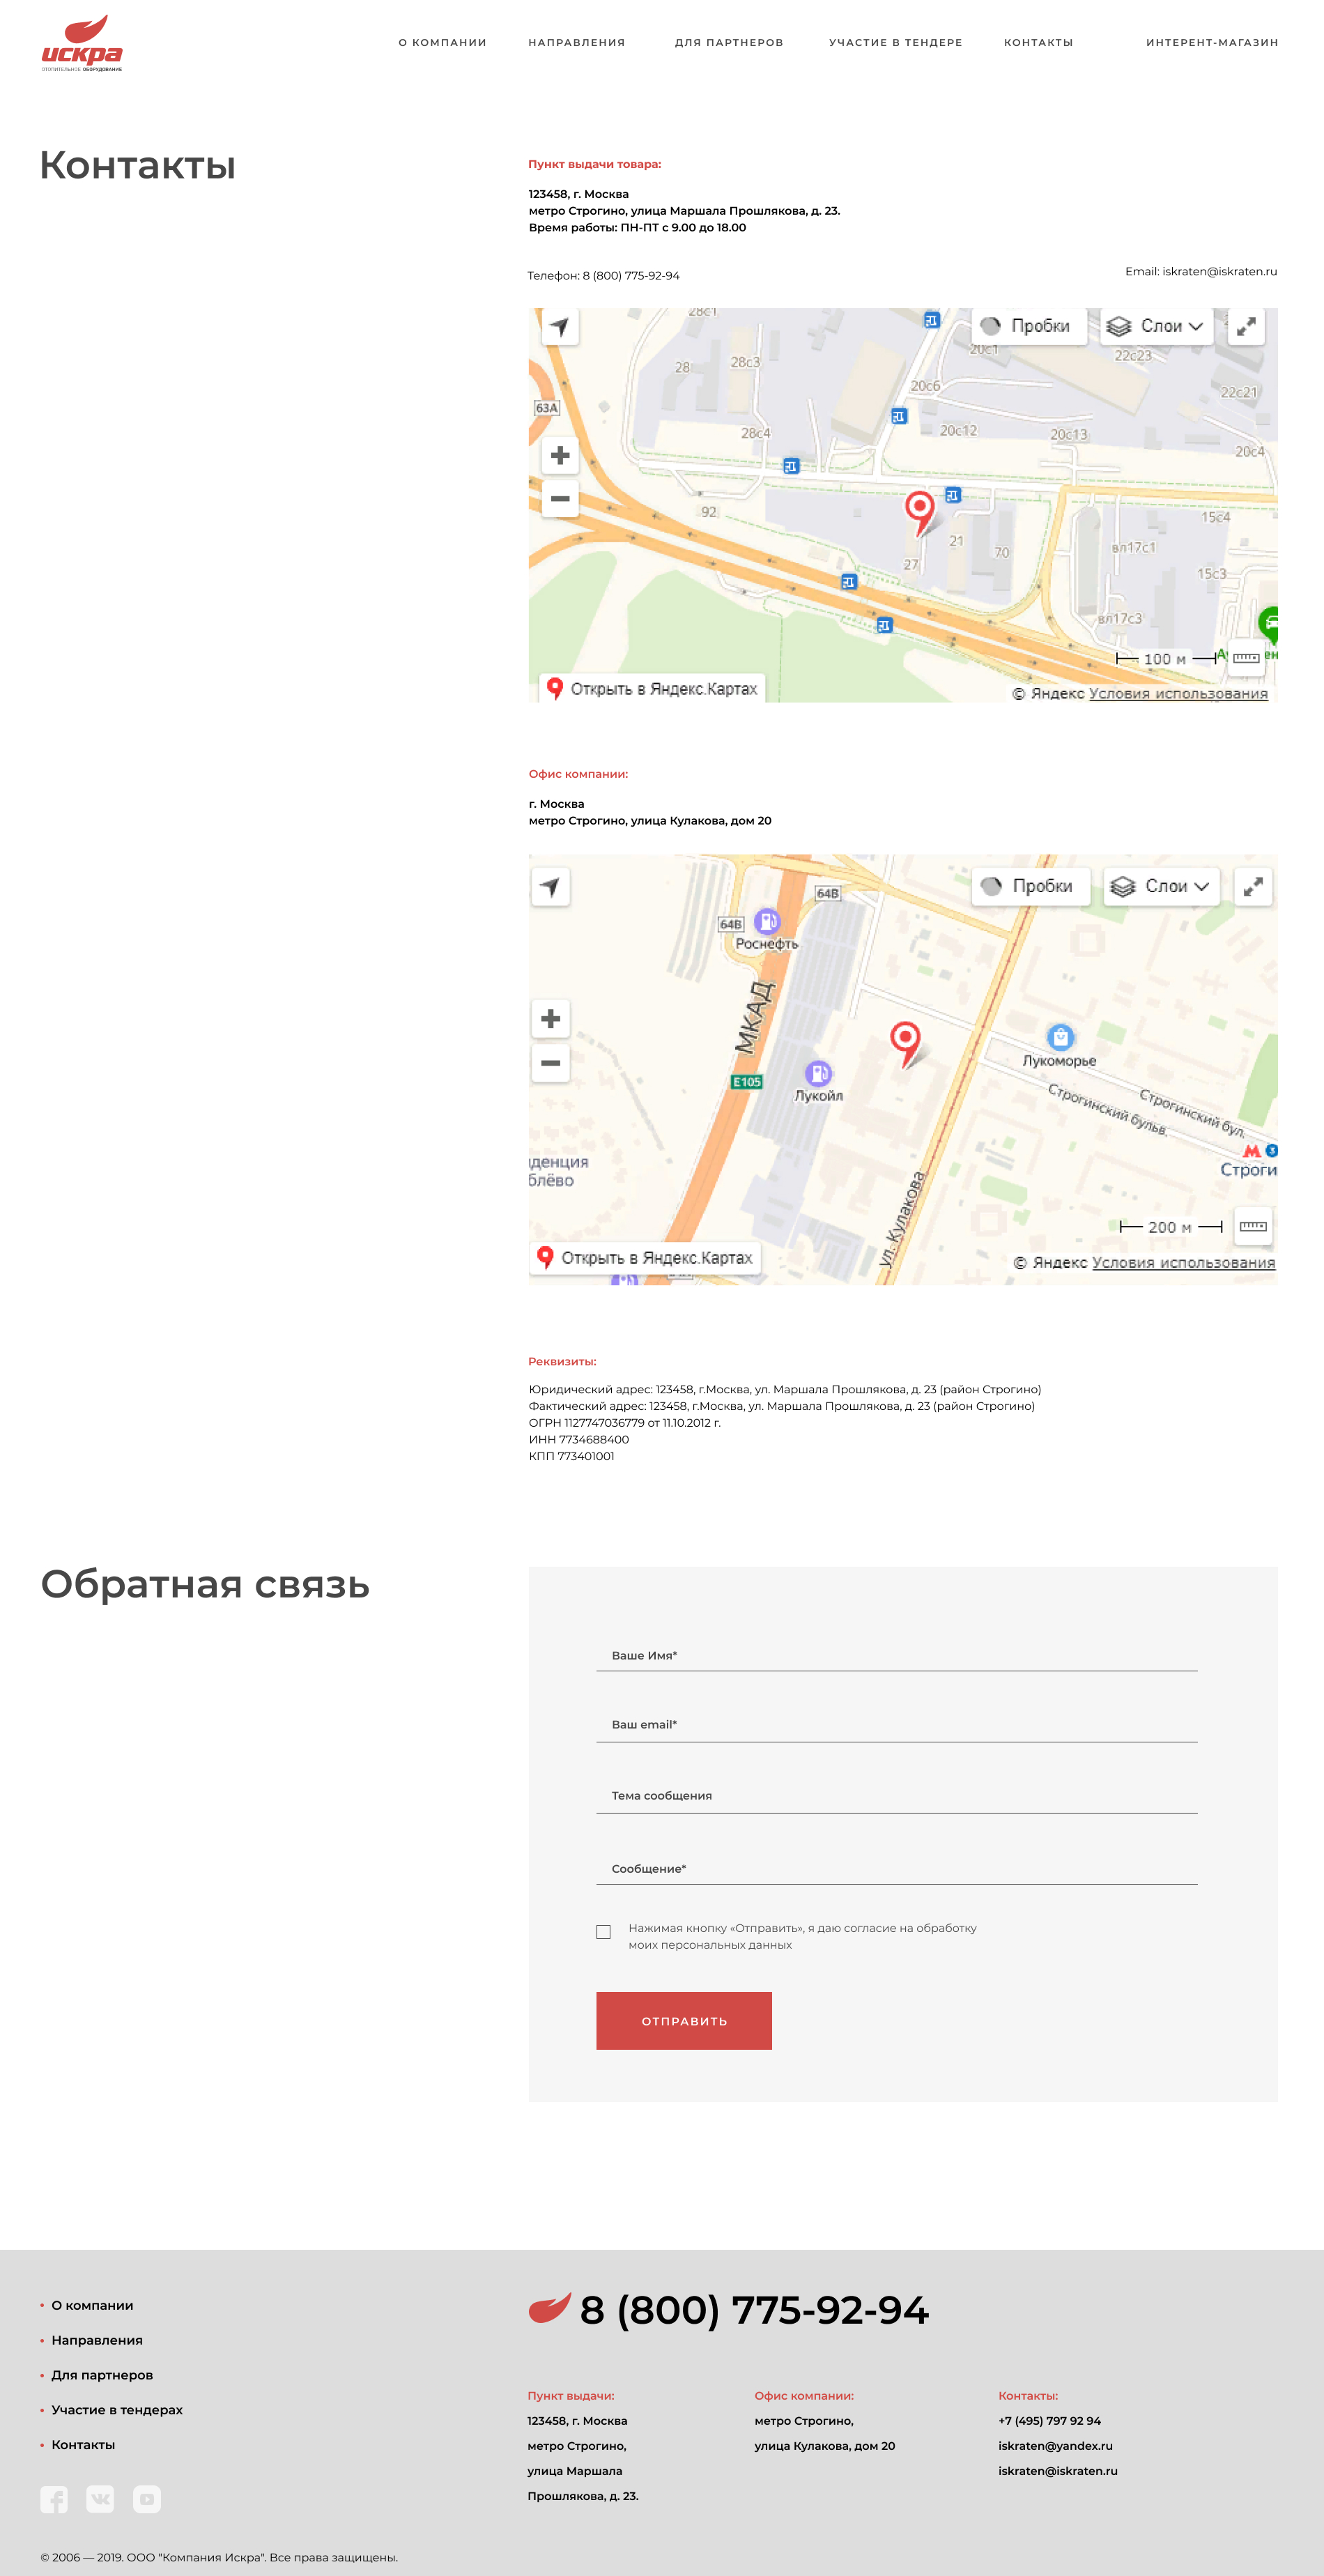 Дизайн сайта-визитки компании фото f_6185d26035d19dd2.jpg